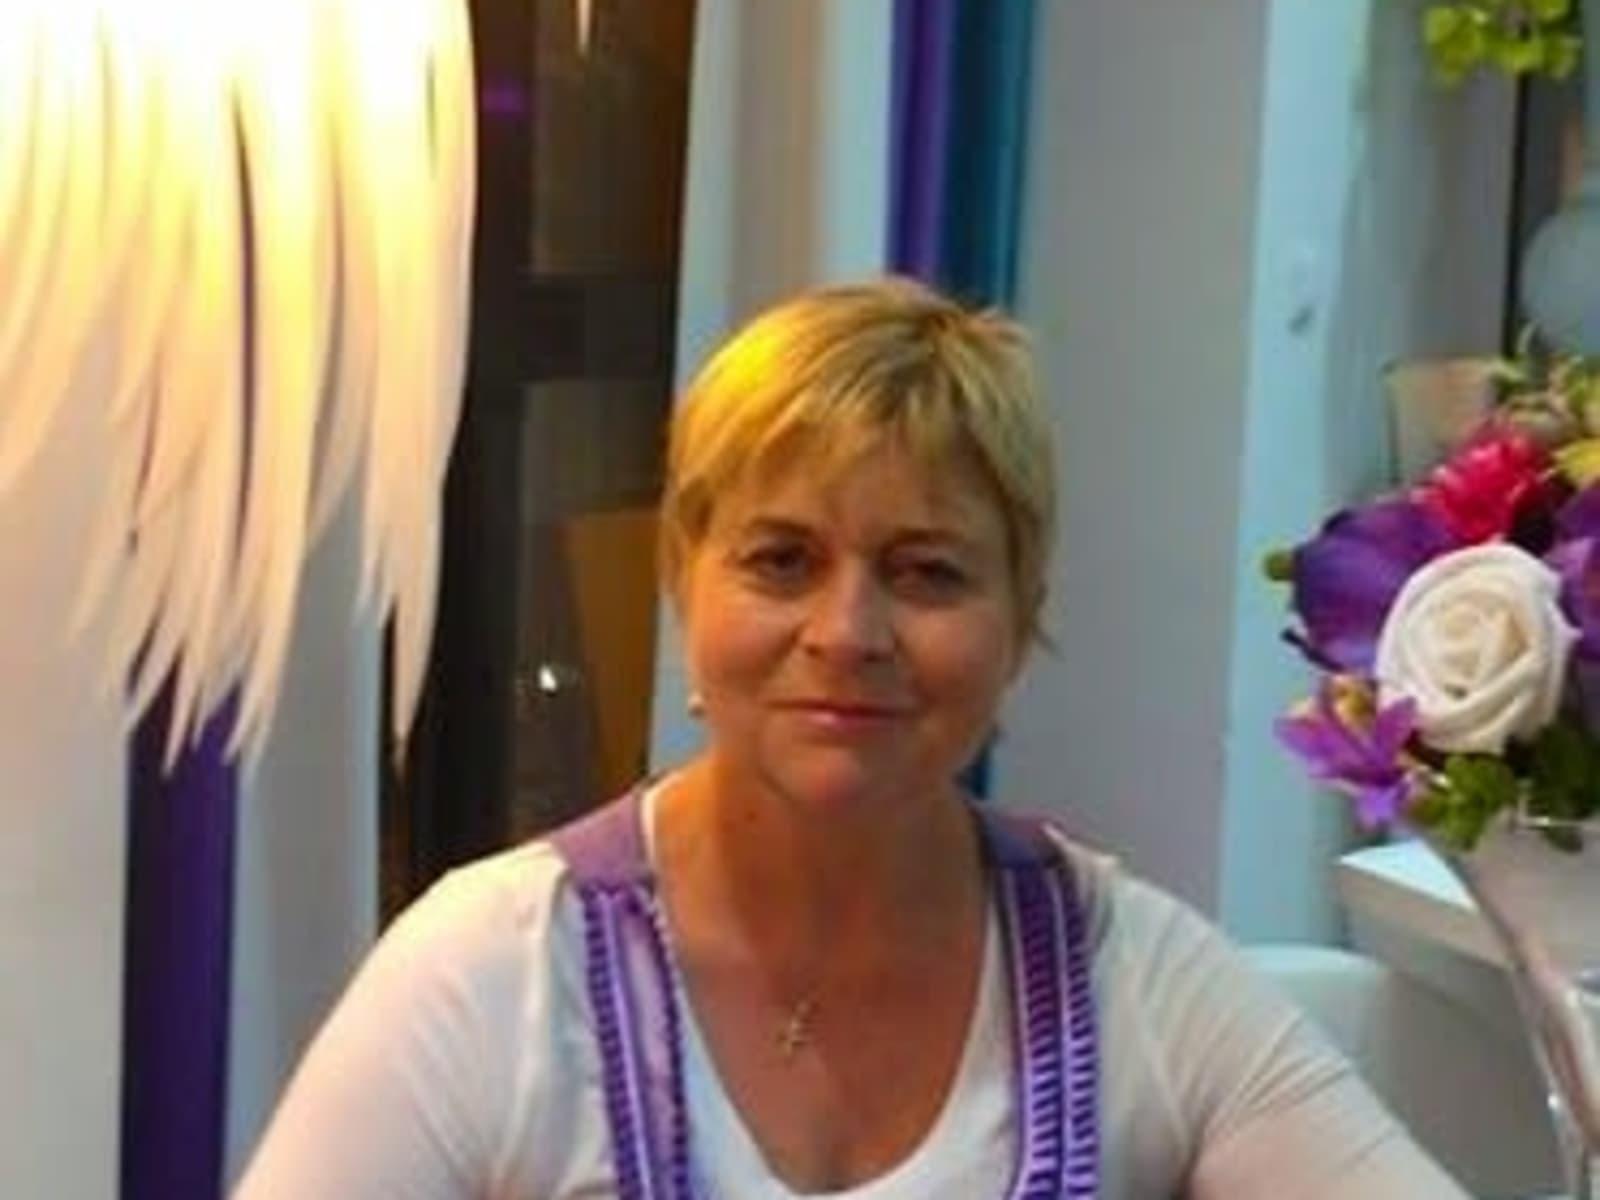 Karen from Melbourne, Victoria, Australia